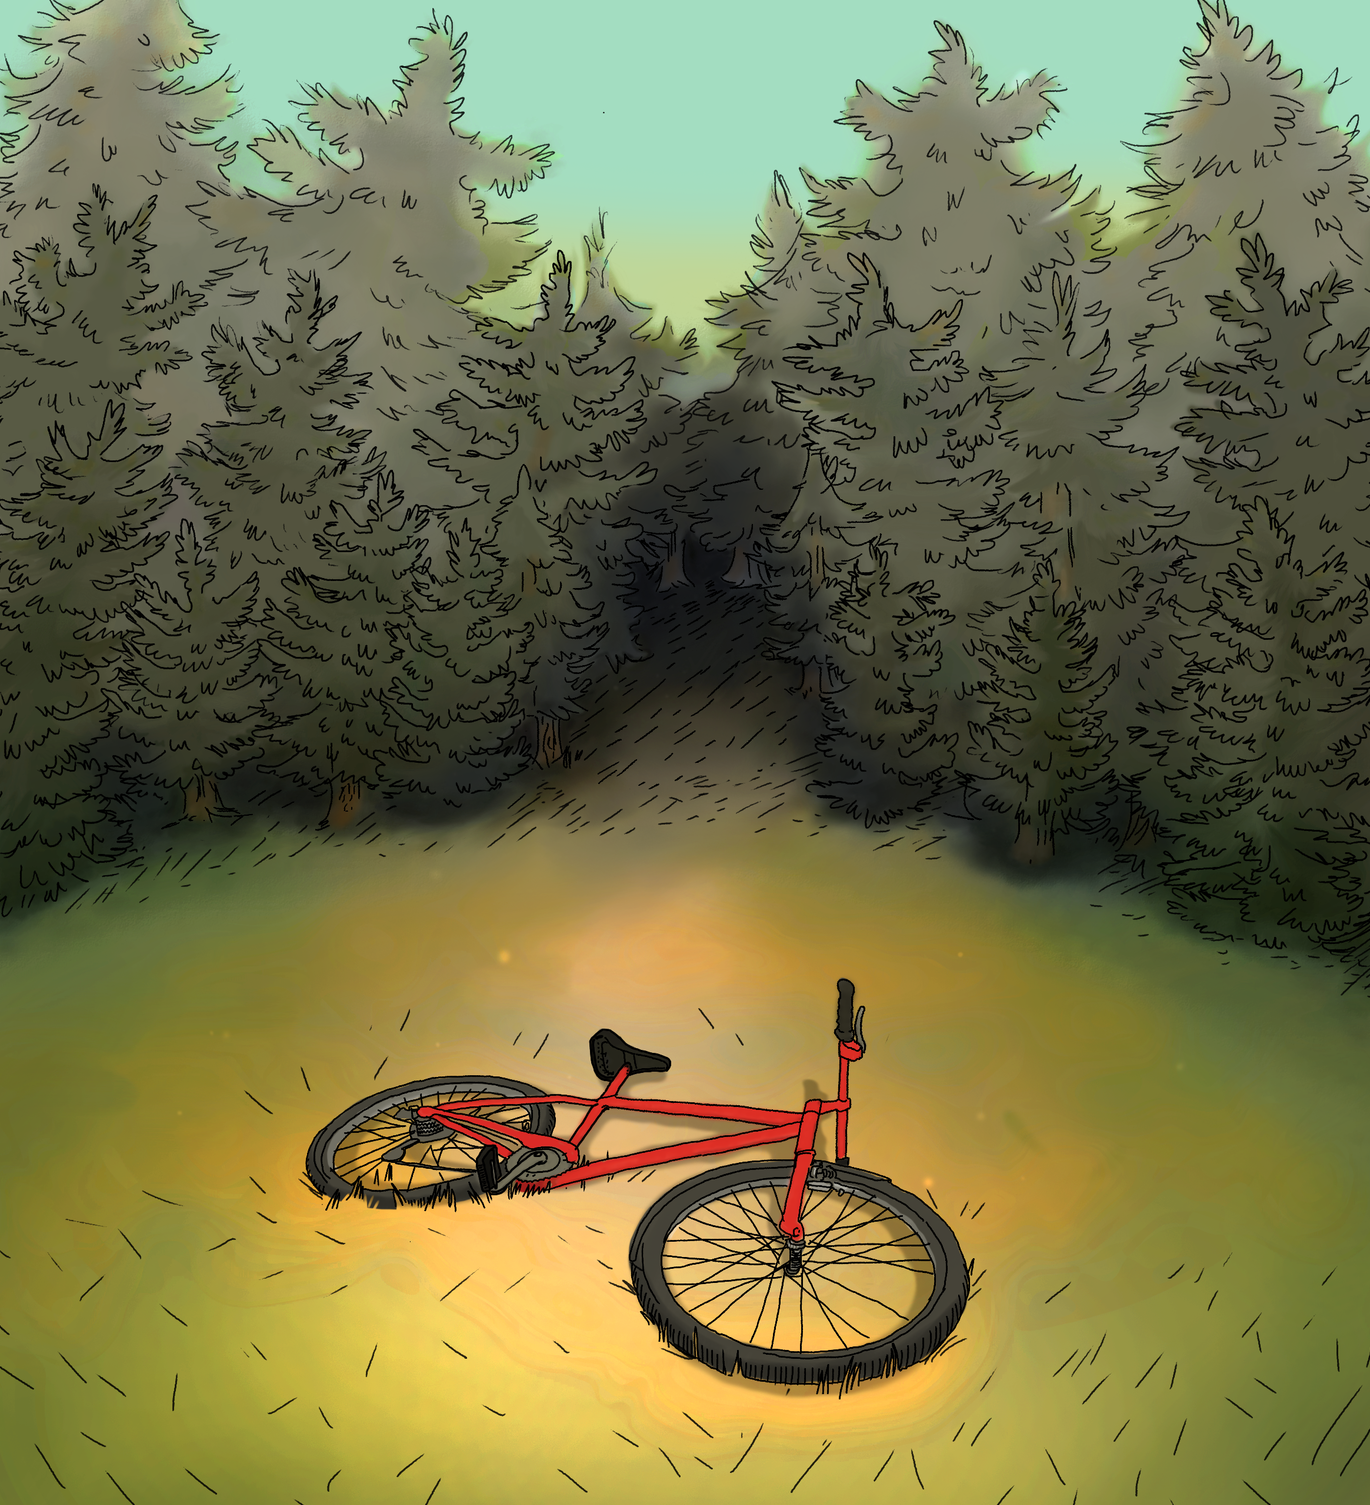 Bike in grass, 2015 Or Gotham